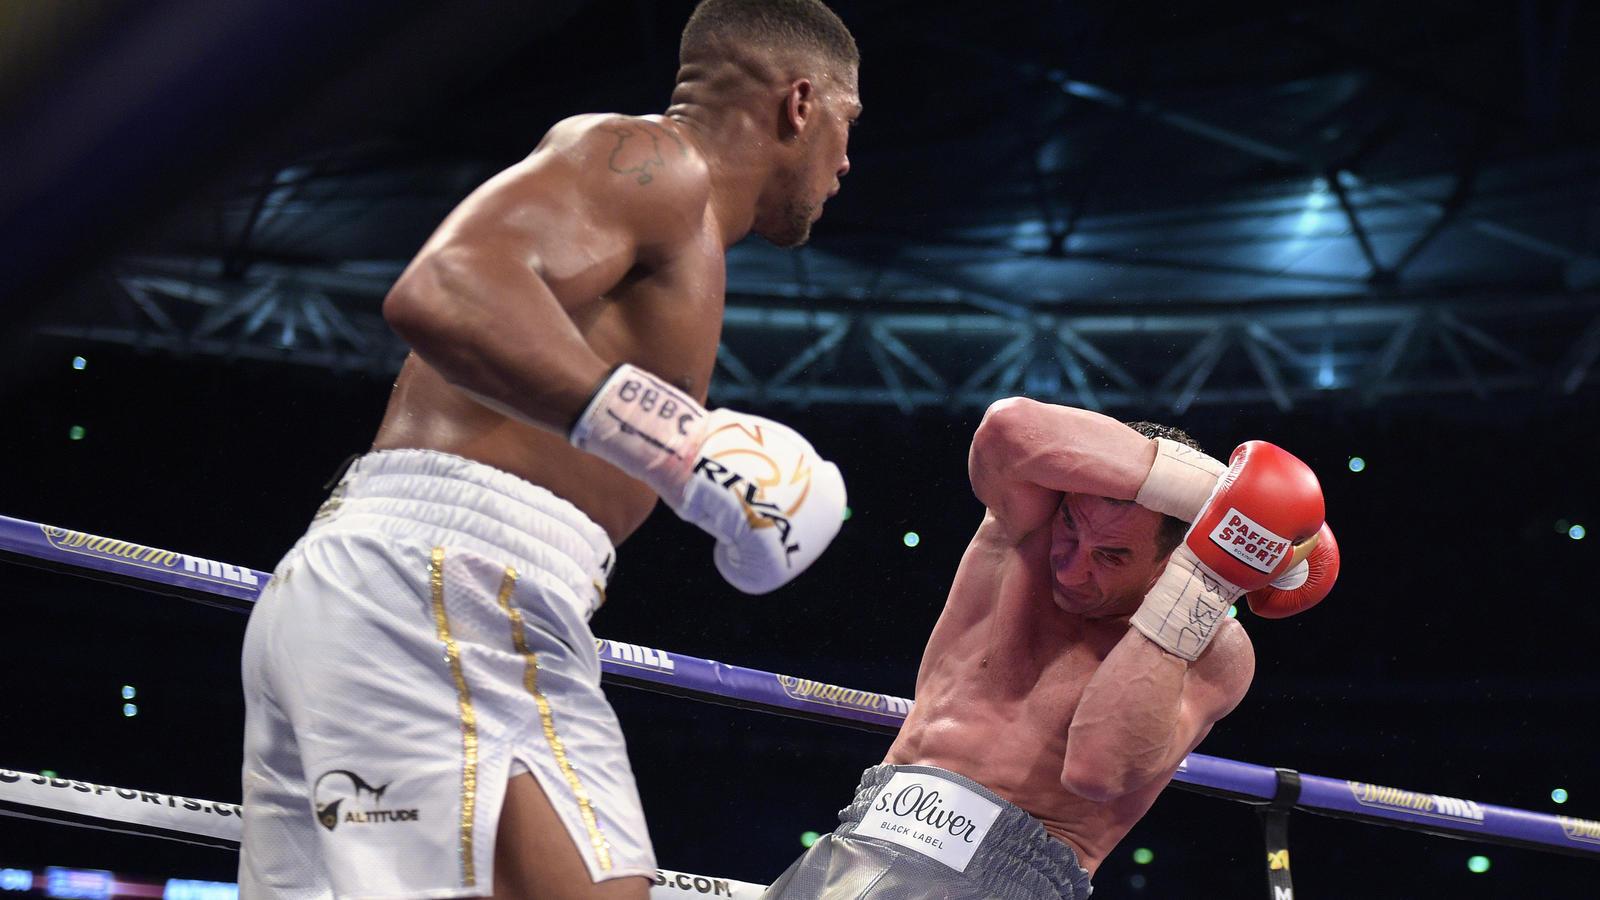 Boxen Klitschko Gegen Joshua